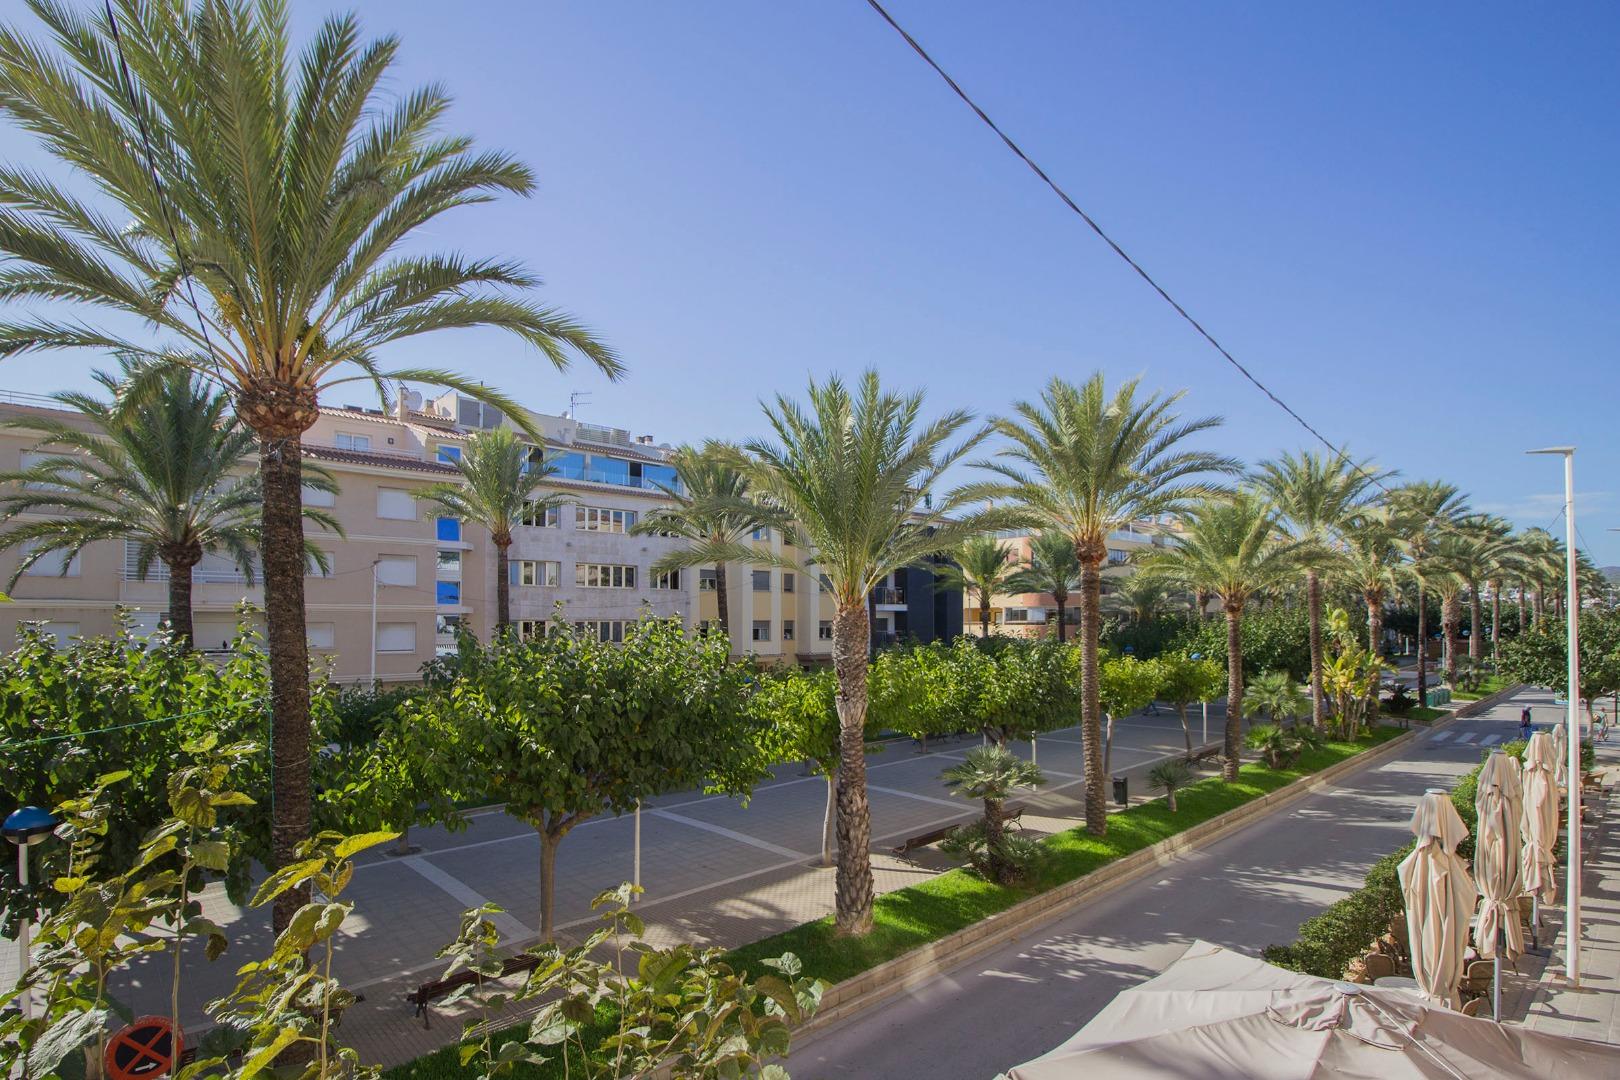 Lloguer Pis  Avenida de la paz, 13. Apartamento anita en primera linea del mar